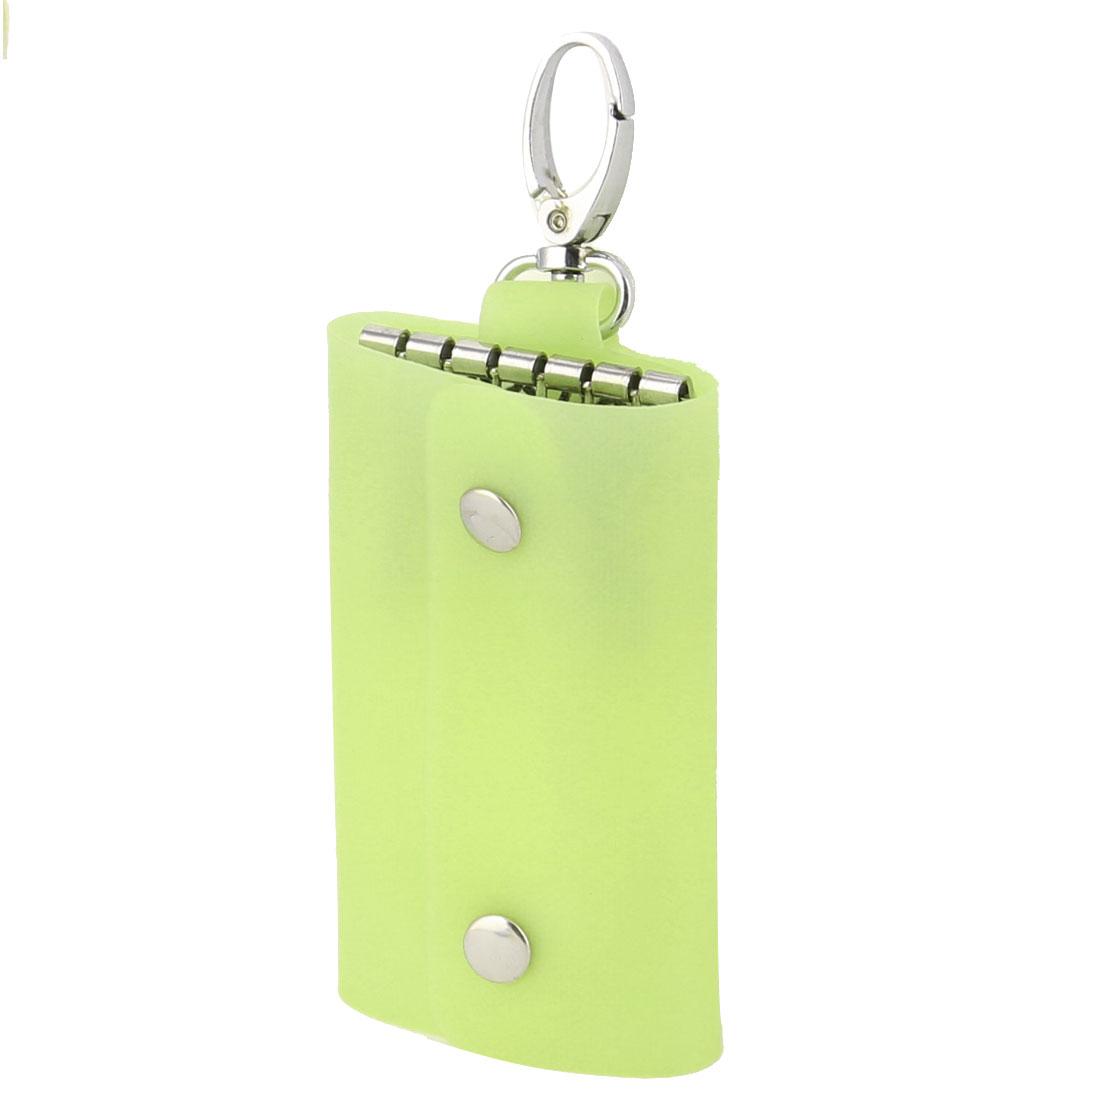 Plastic Cover Six Metal Hooks Portable Keys Holder Bag Case Silver Tone Yellow